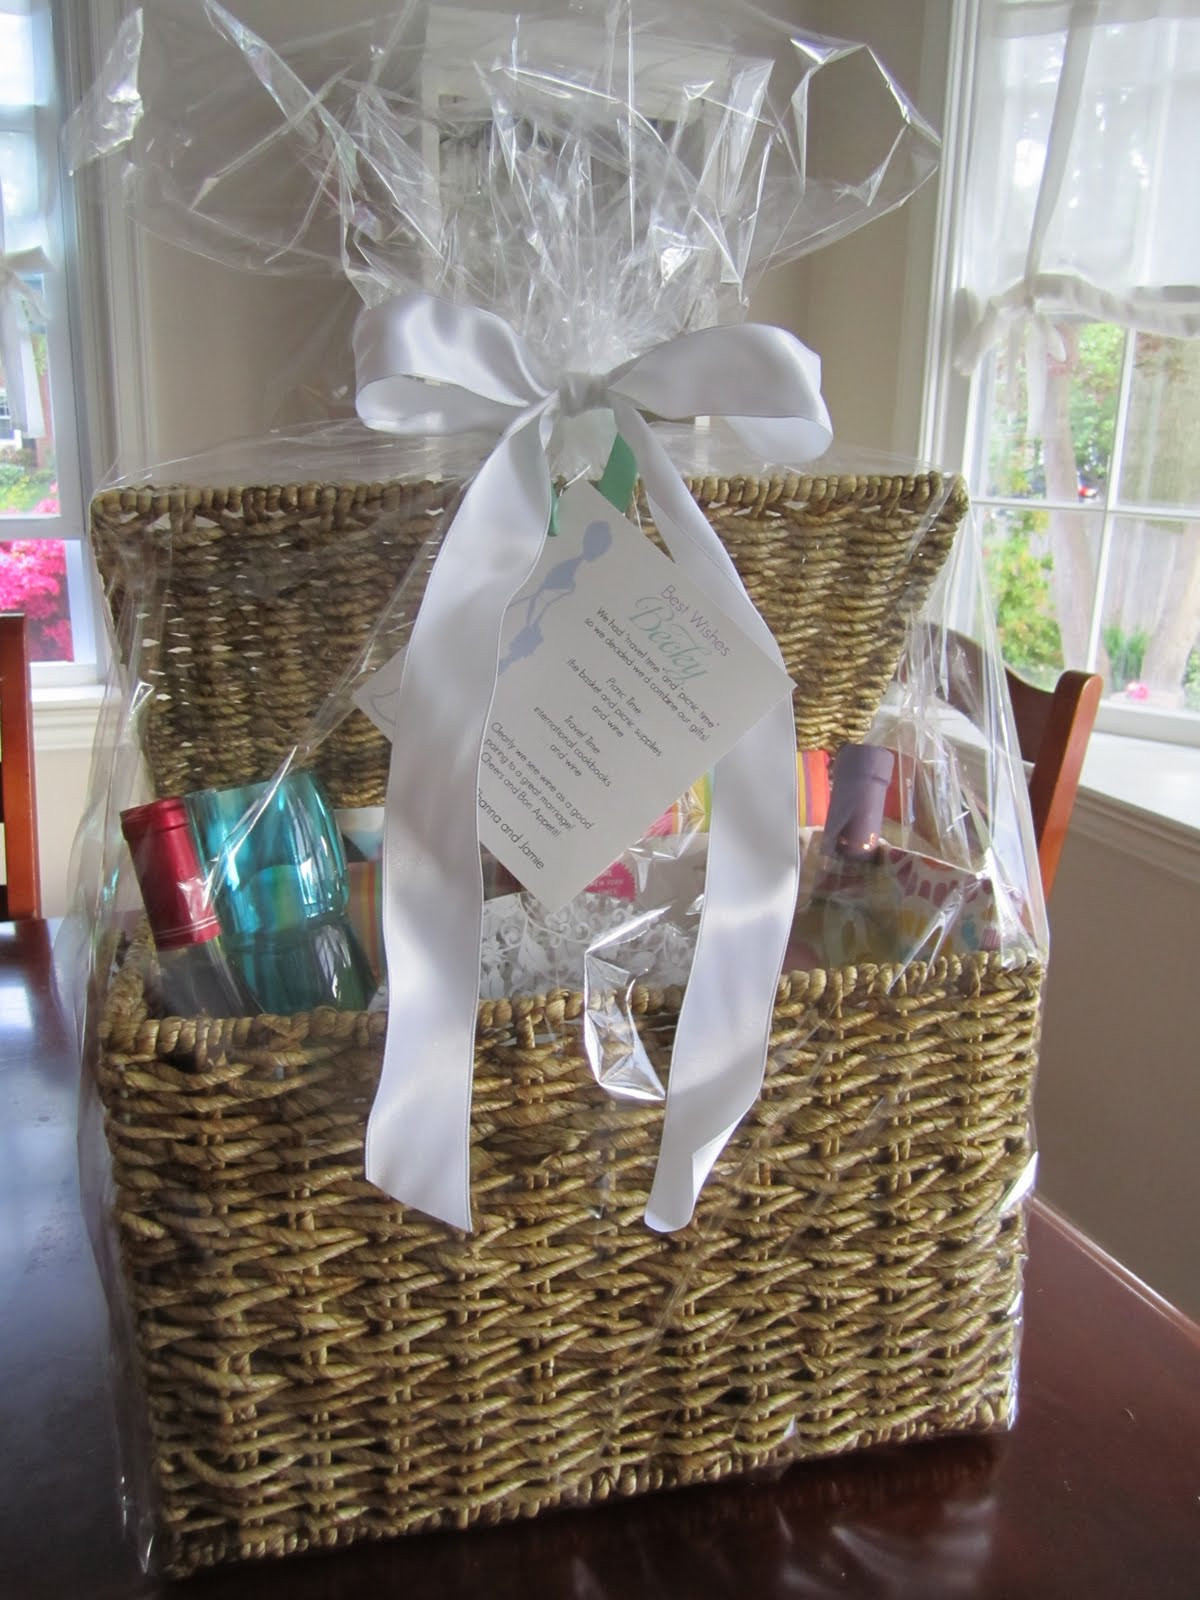 Creative Bridal Shower Gift Basket Ideas  unique wedding shower t basket ideas Bridal Shower